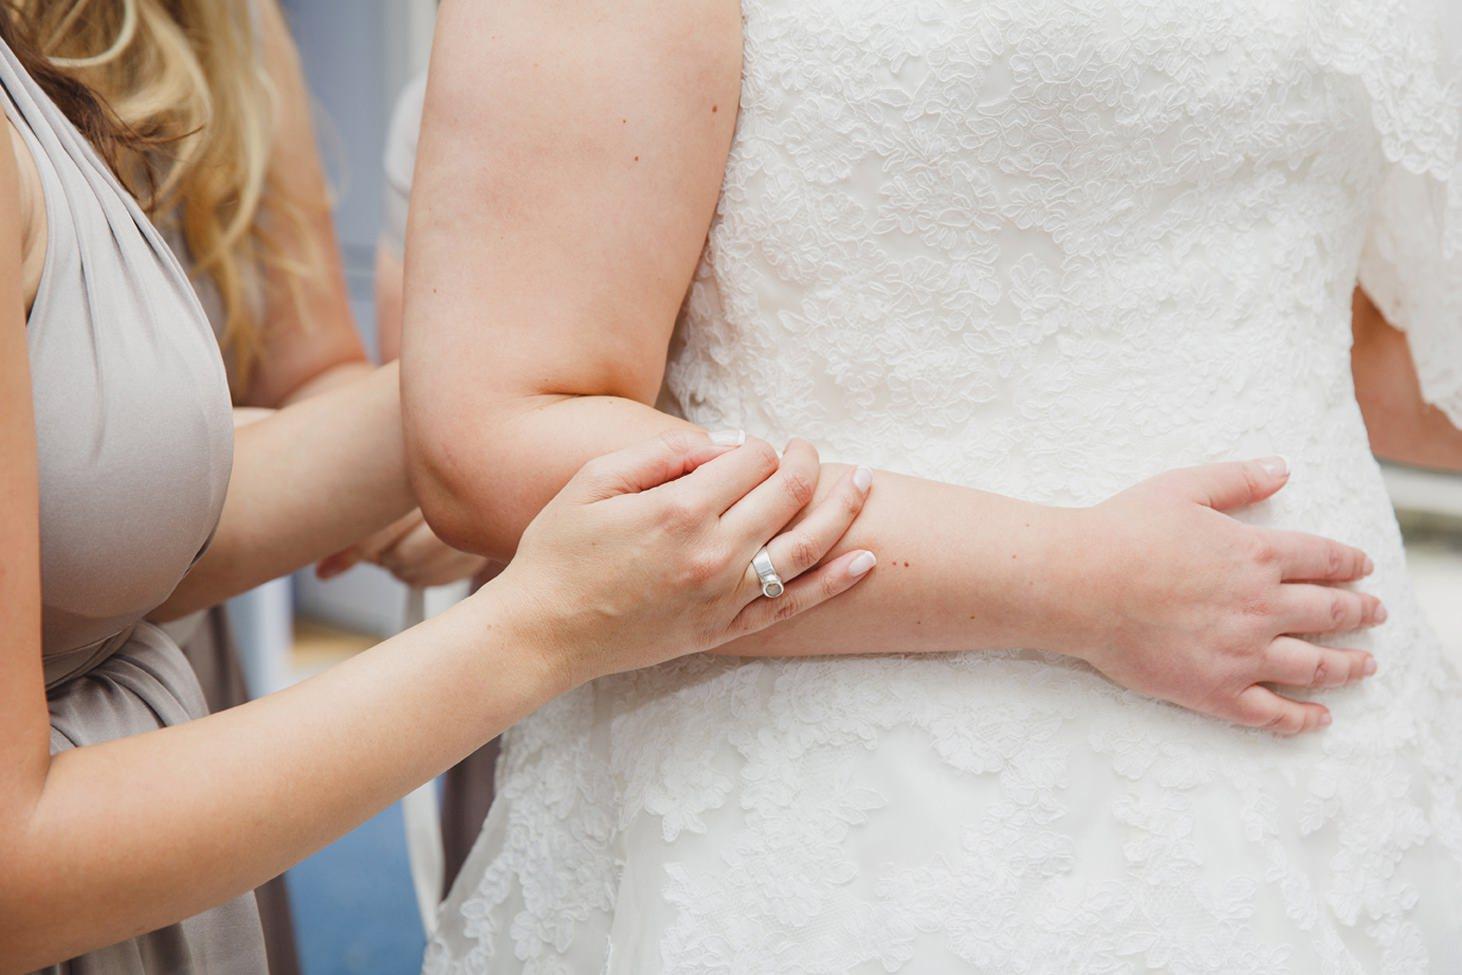 Wycombe Abbey wedding photography bridesmaids holding bride